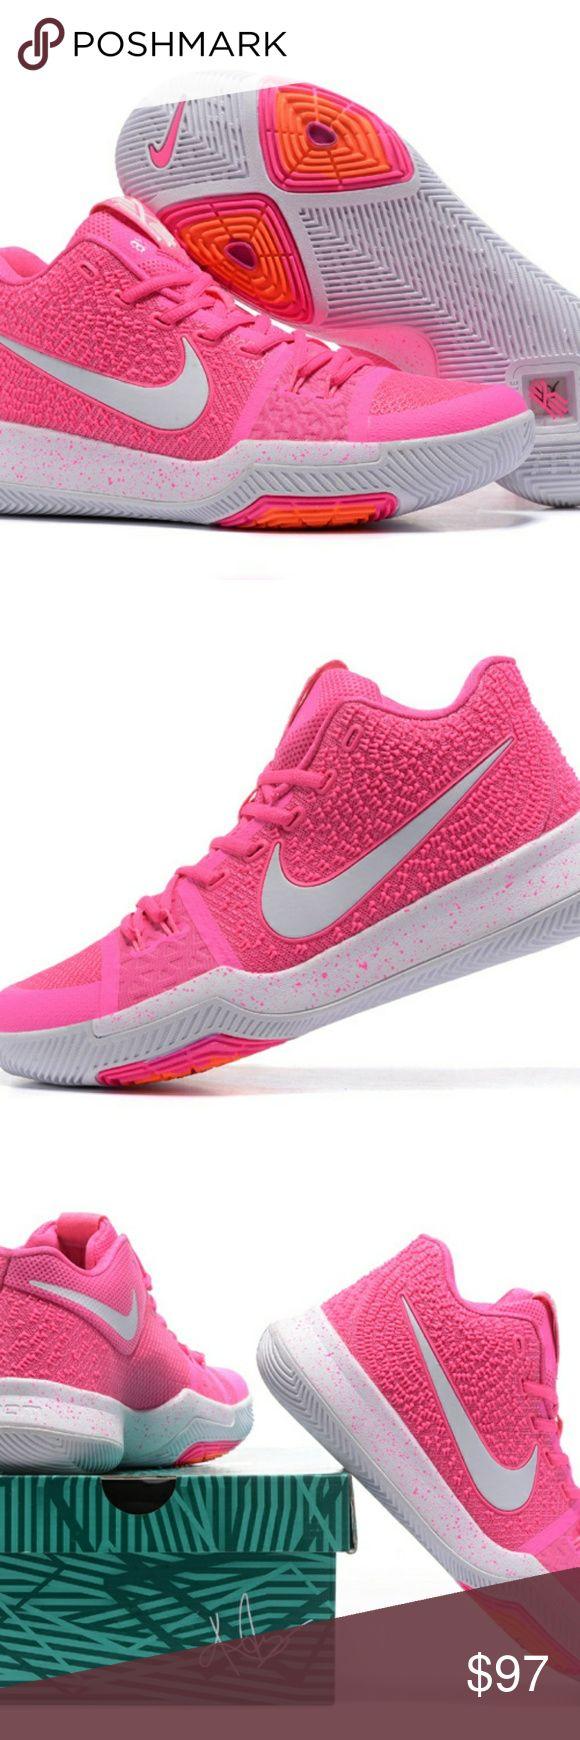 discount sale 1e74e c882e ... Newest Nike Kyrie 3 EP III Irving Vivid Pink White NWT . ...